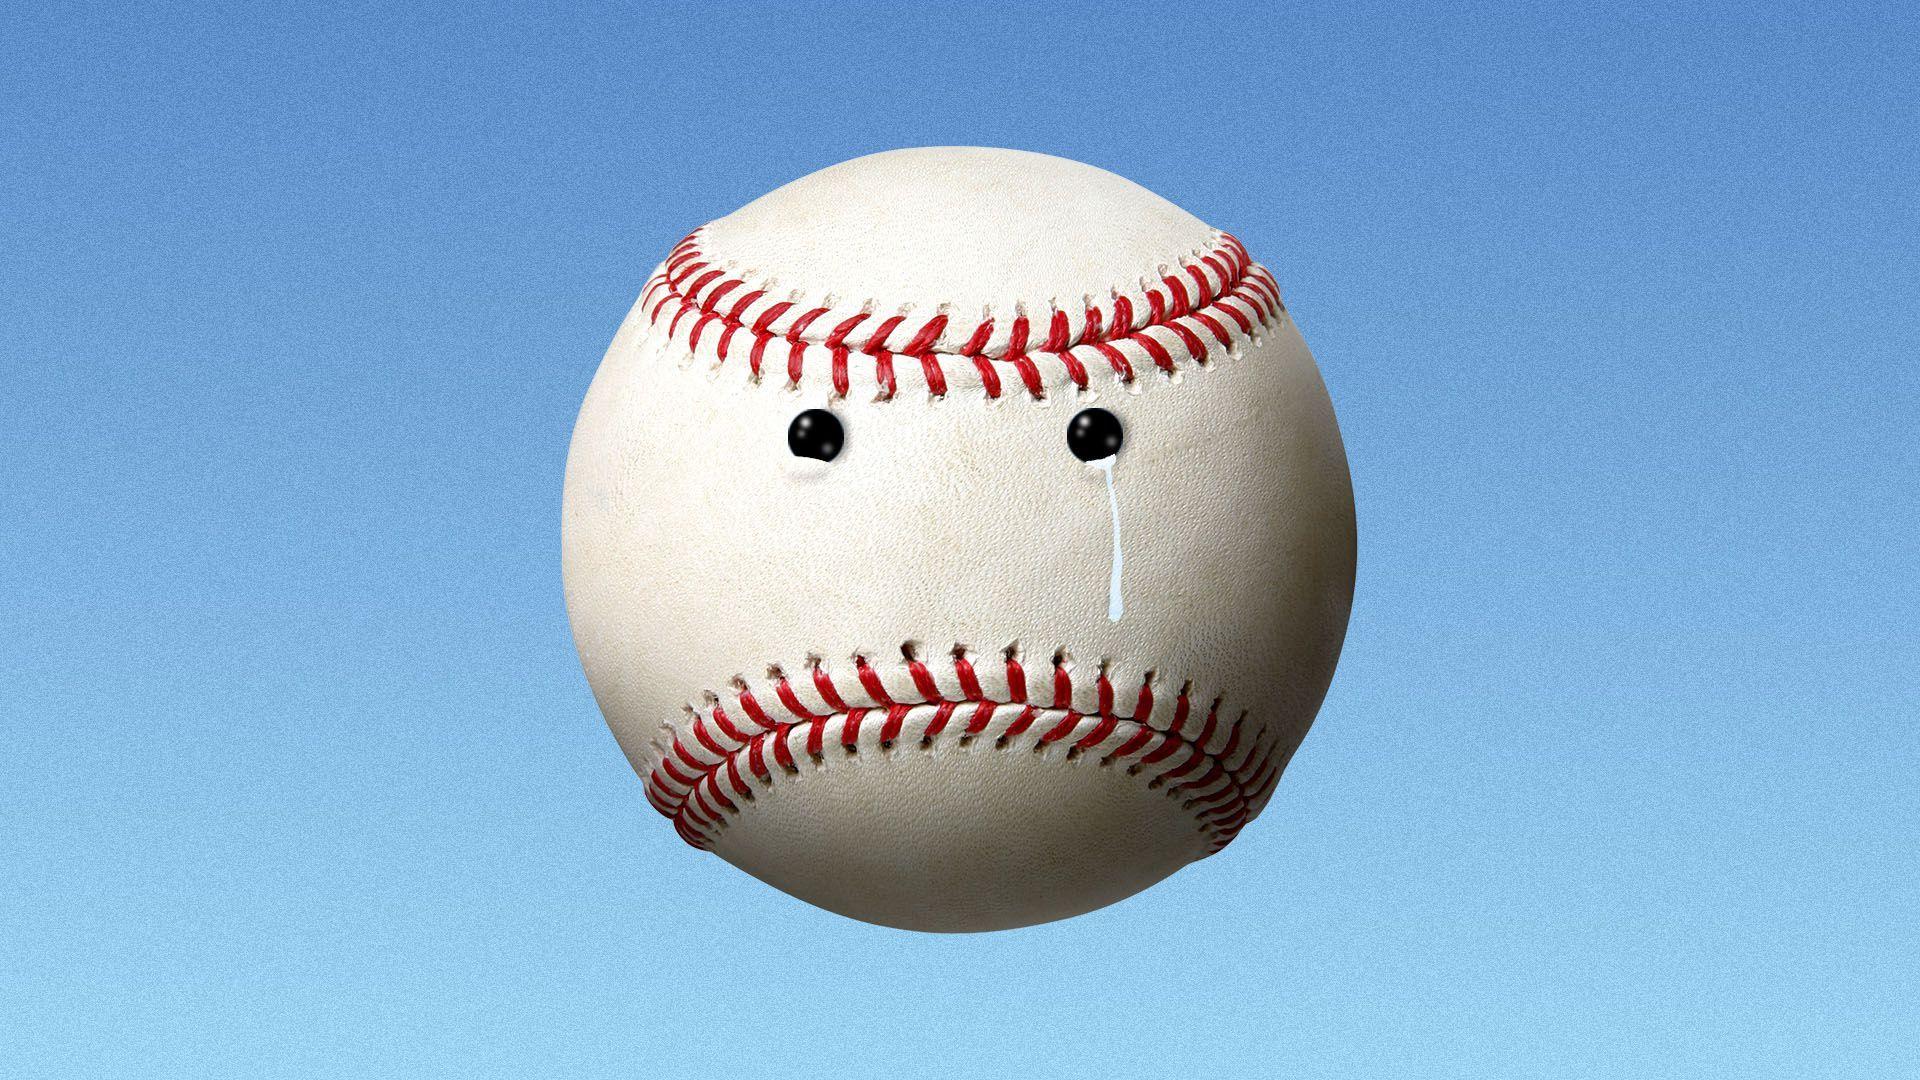 Illustration of a crying baseball